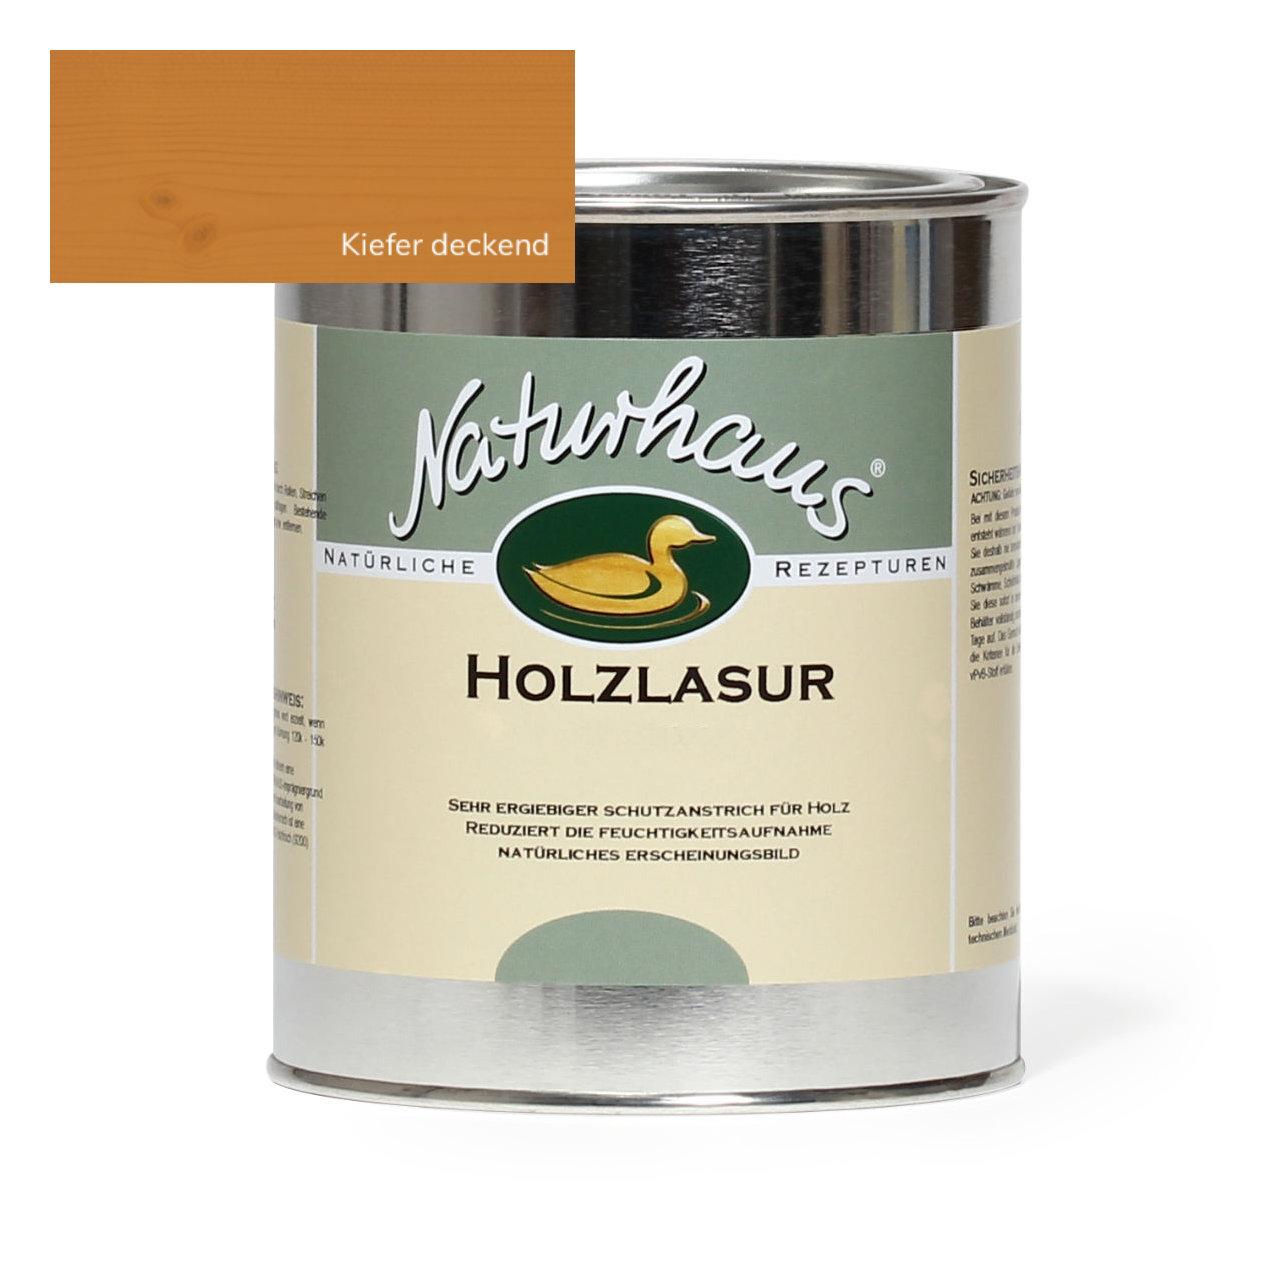 Top NATURHAUS Holzlasur für Außen Kiefer deckend   Naturhaus direkt XG26